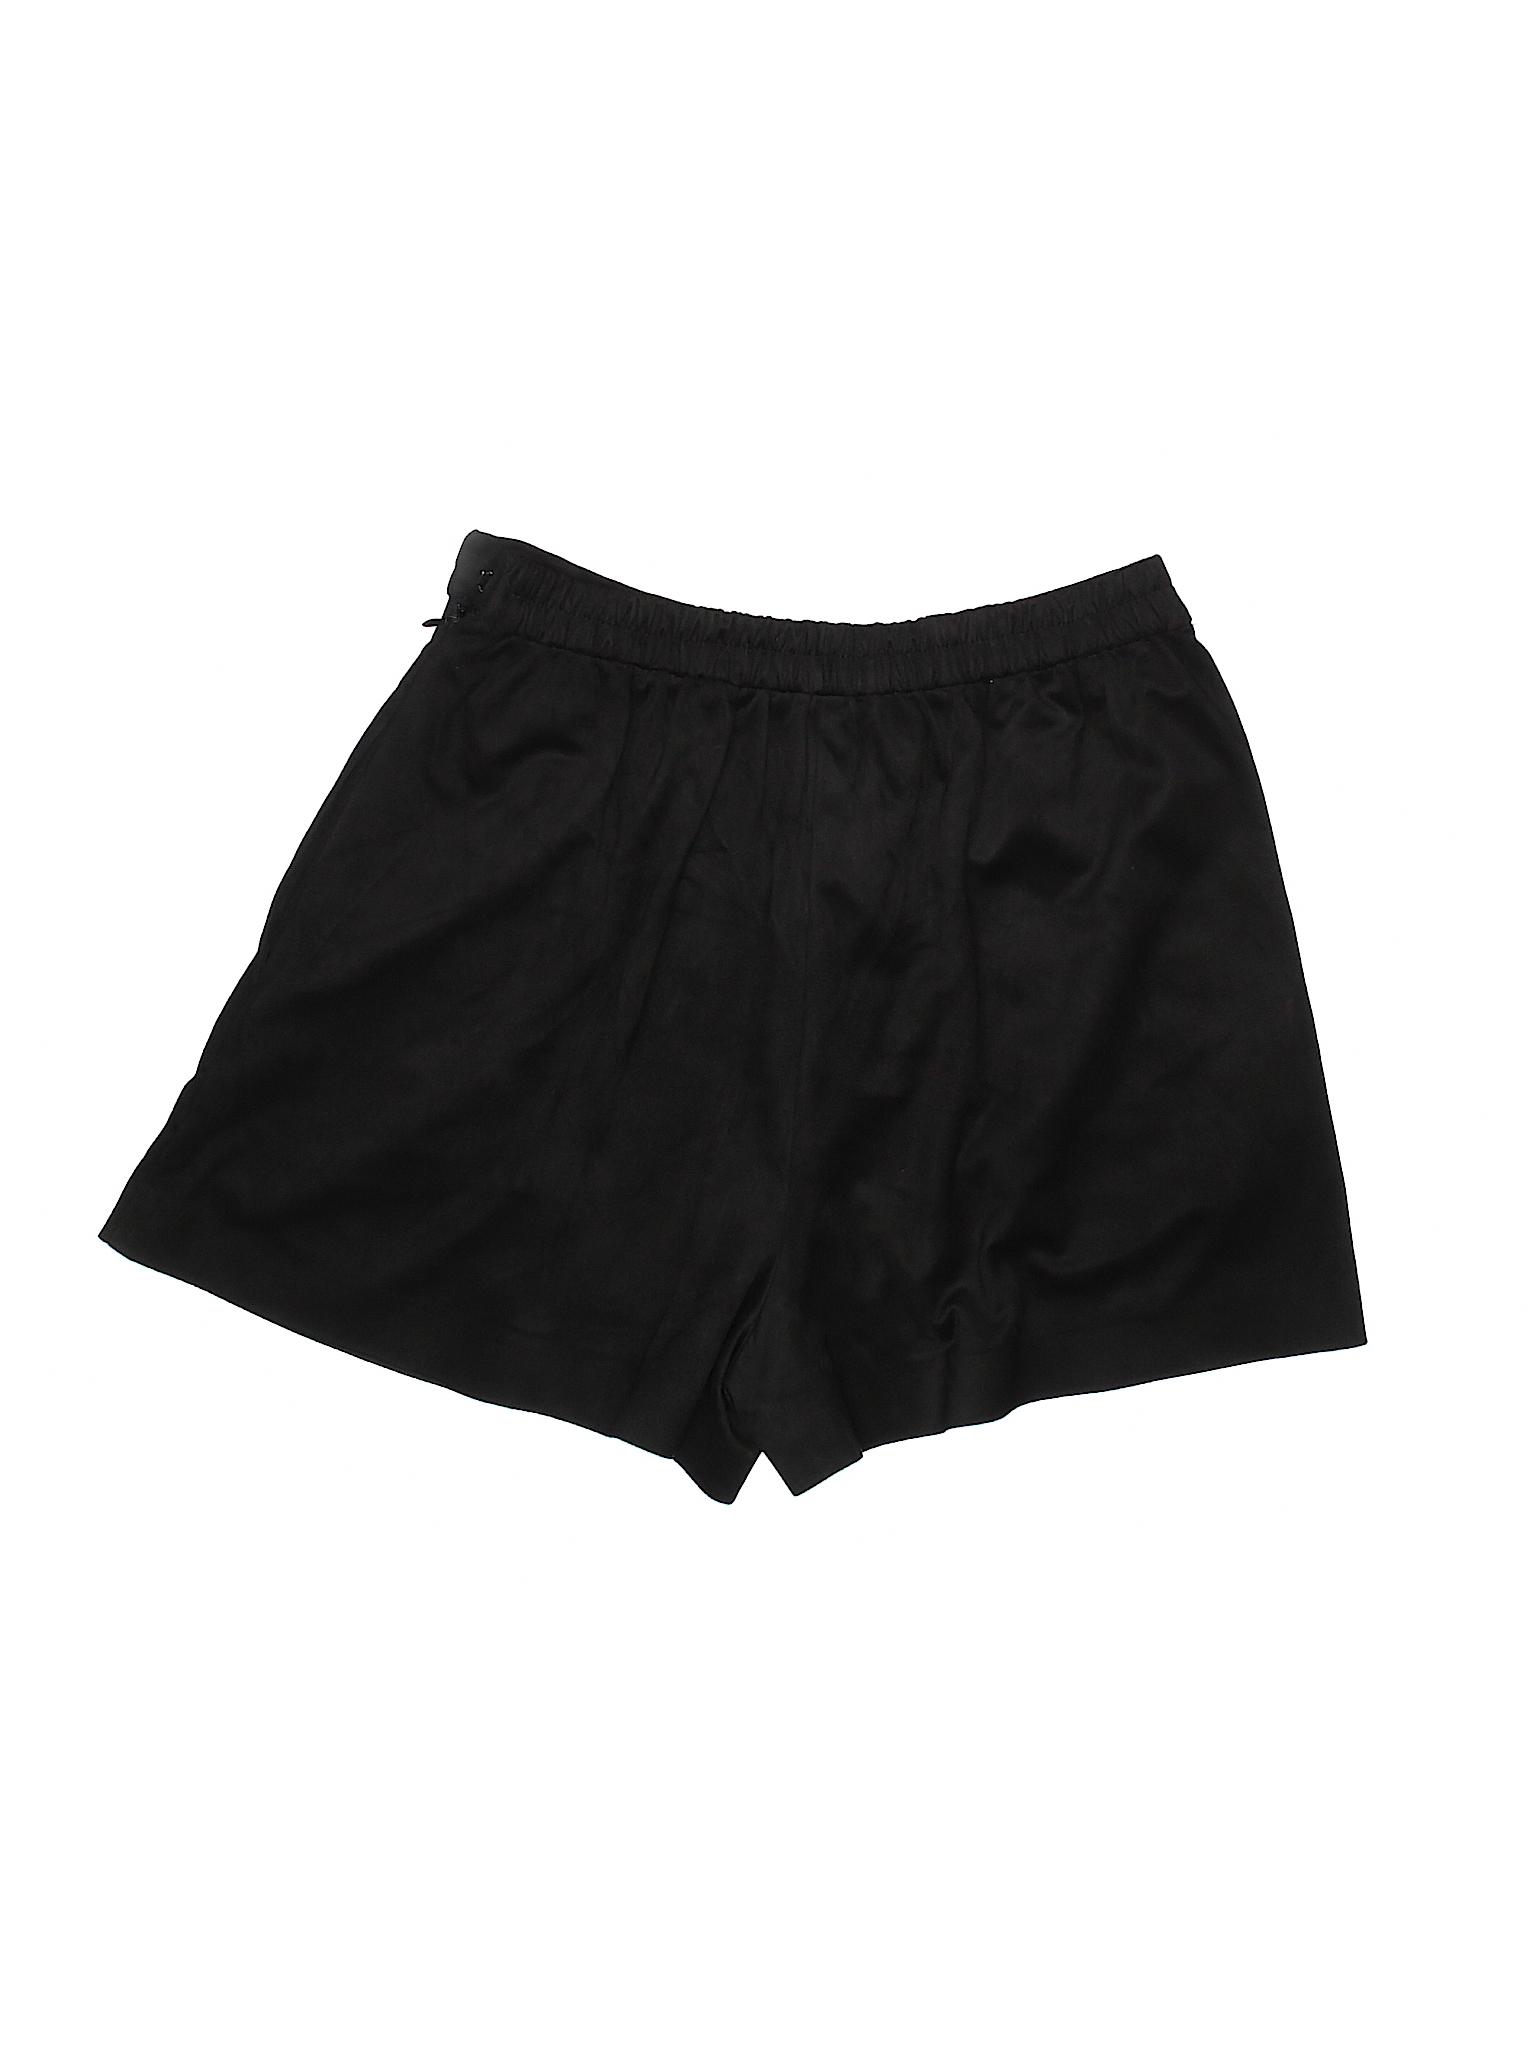 Boutique Shorts Shorts Boutique Trafaluc by Zara Trafaluc Boutique by Zara FUrxOwqF